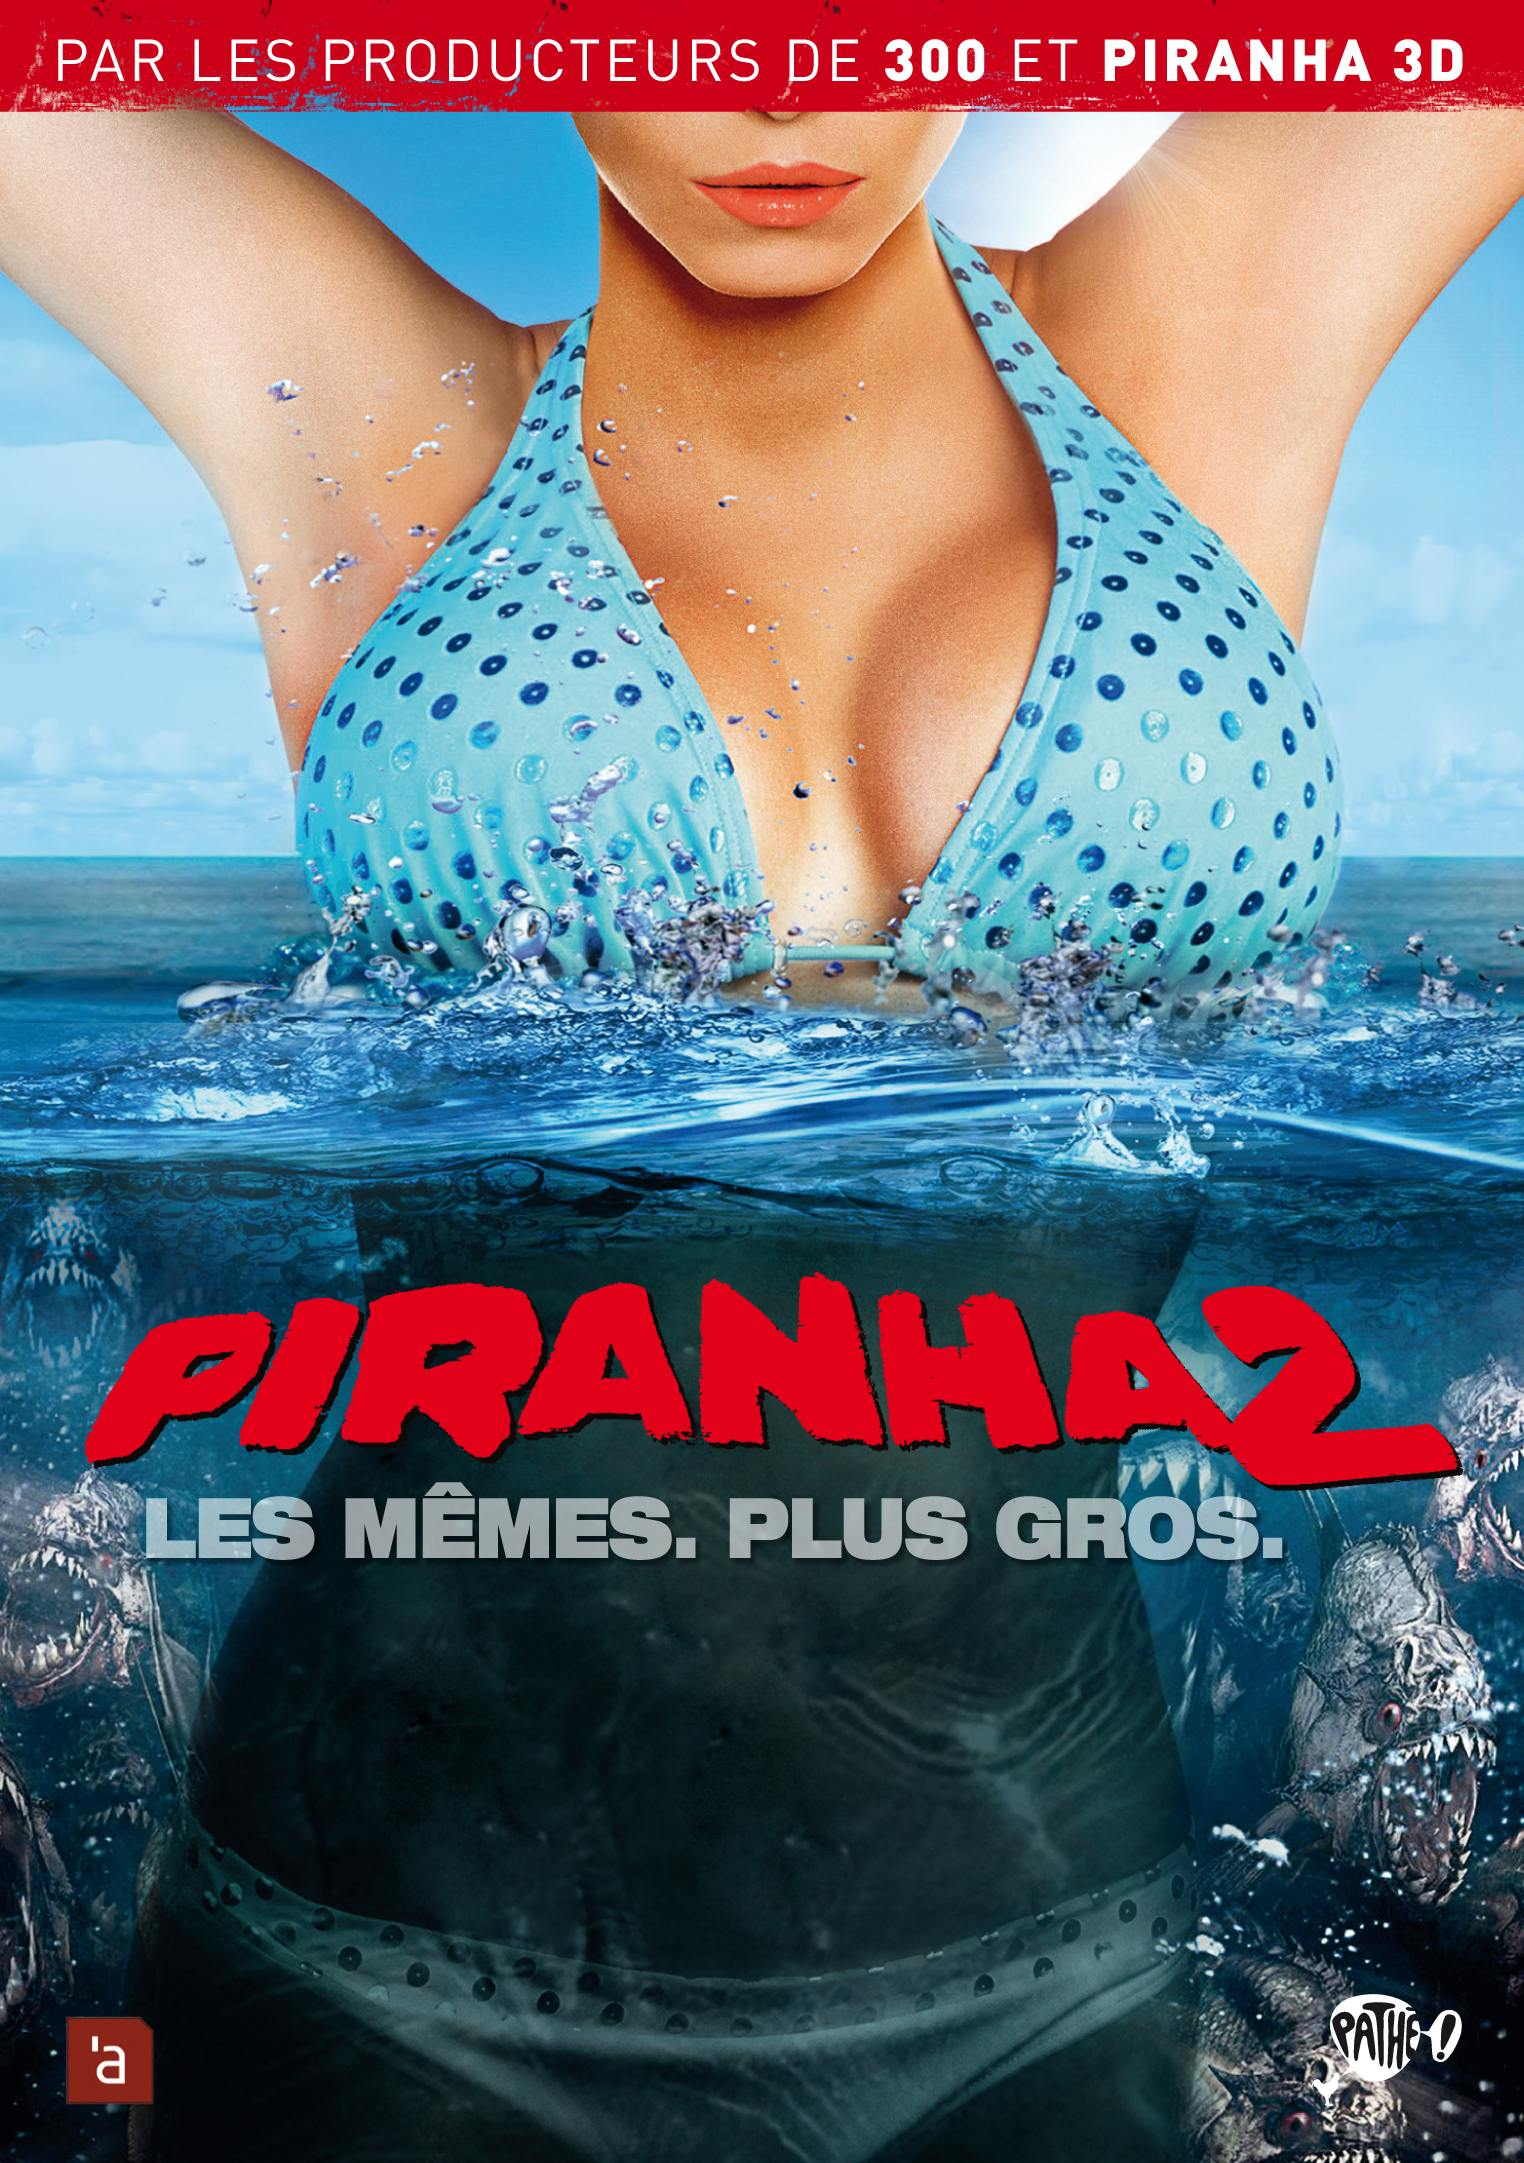 Piranha 2 - dvd